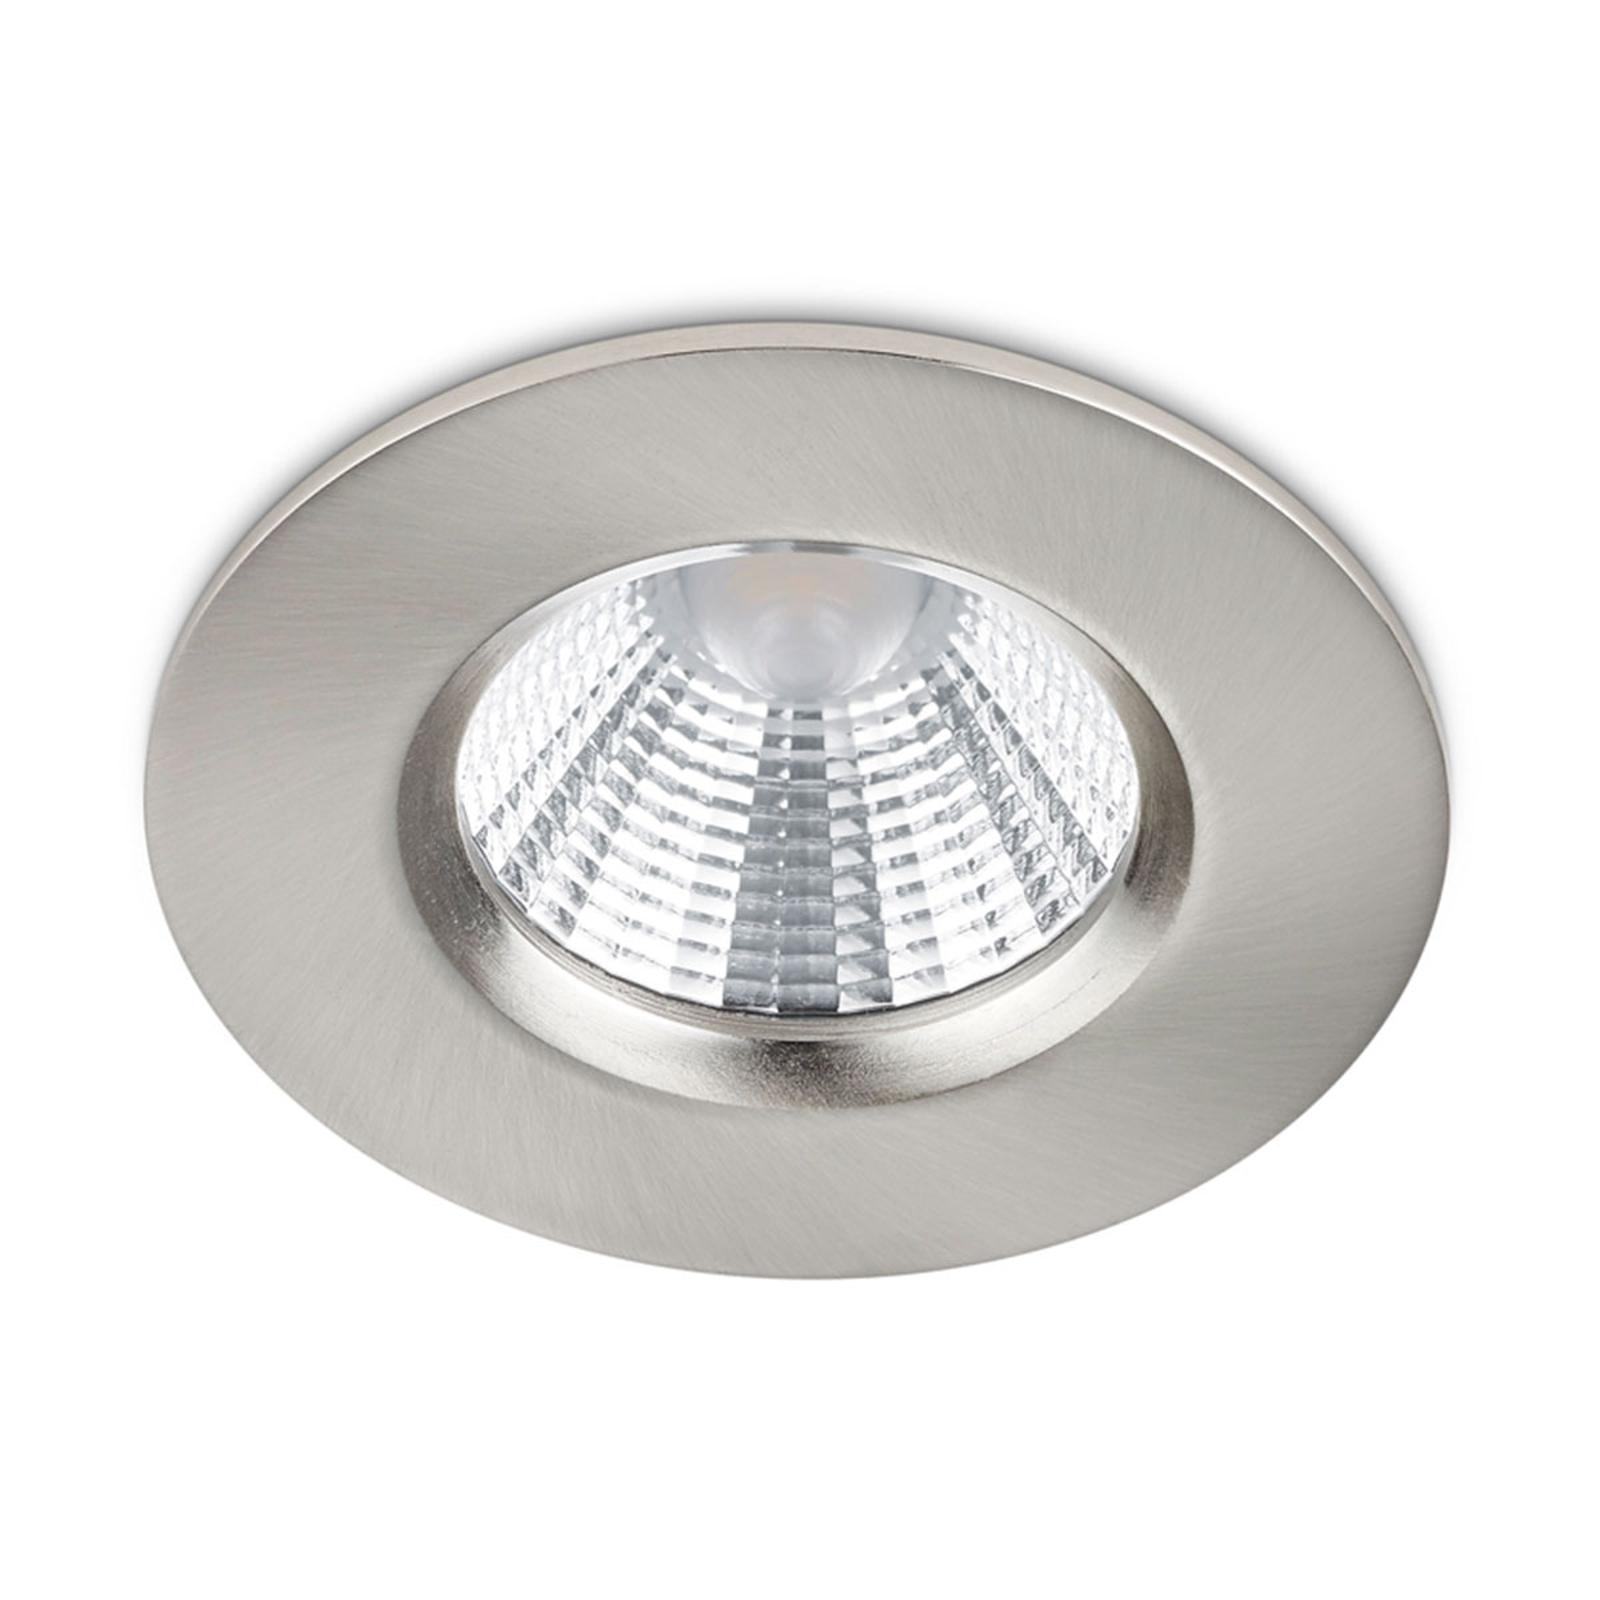 Nikkelkleurige LED inbouwspot Zagros, IP65